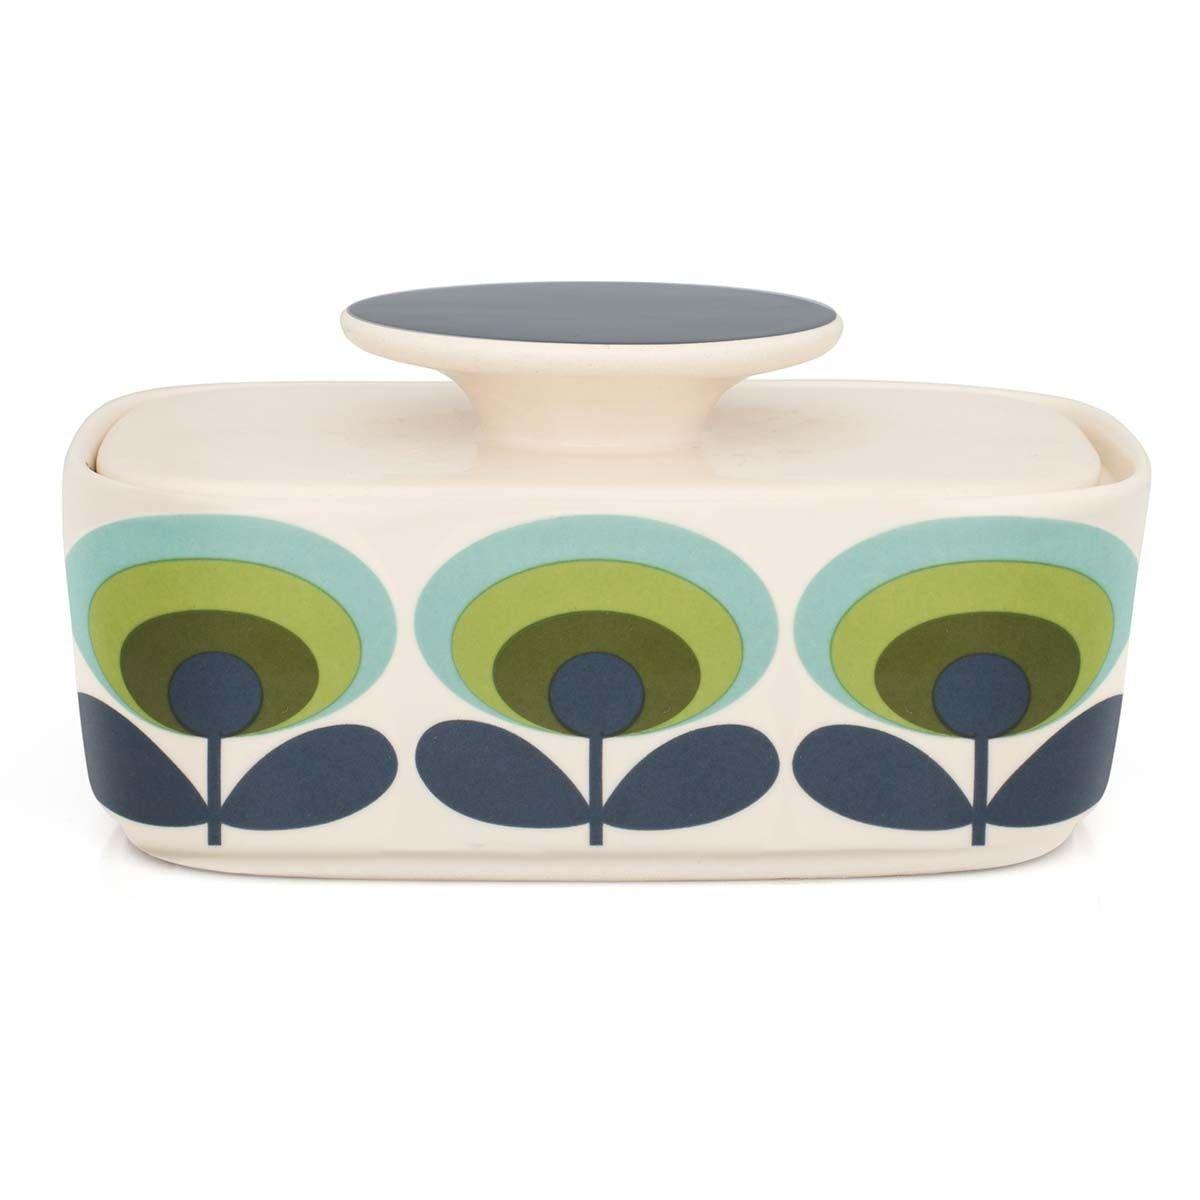 70\'s Flower Butter Dish by Orla Kiely at Dotmaison | Orla Kiely ...